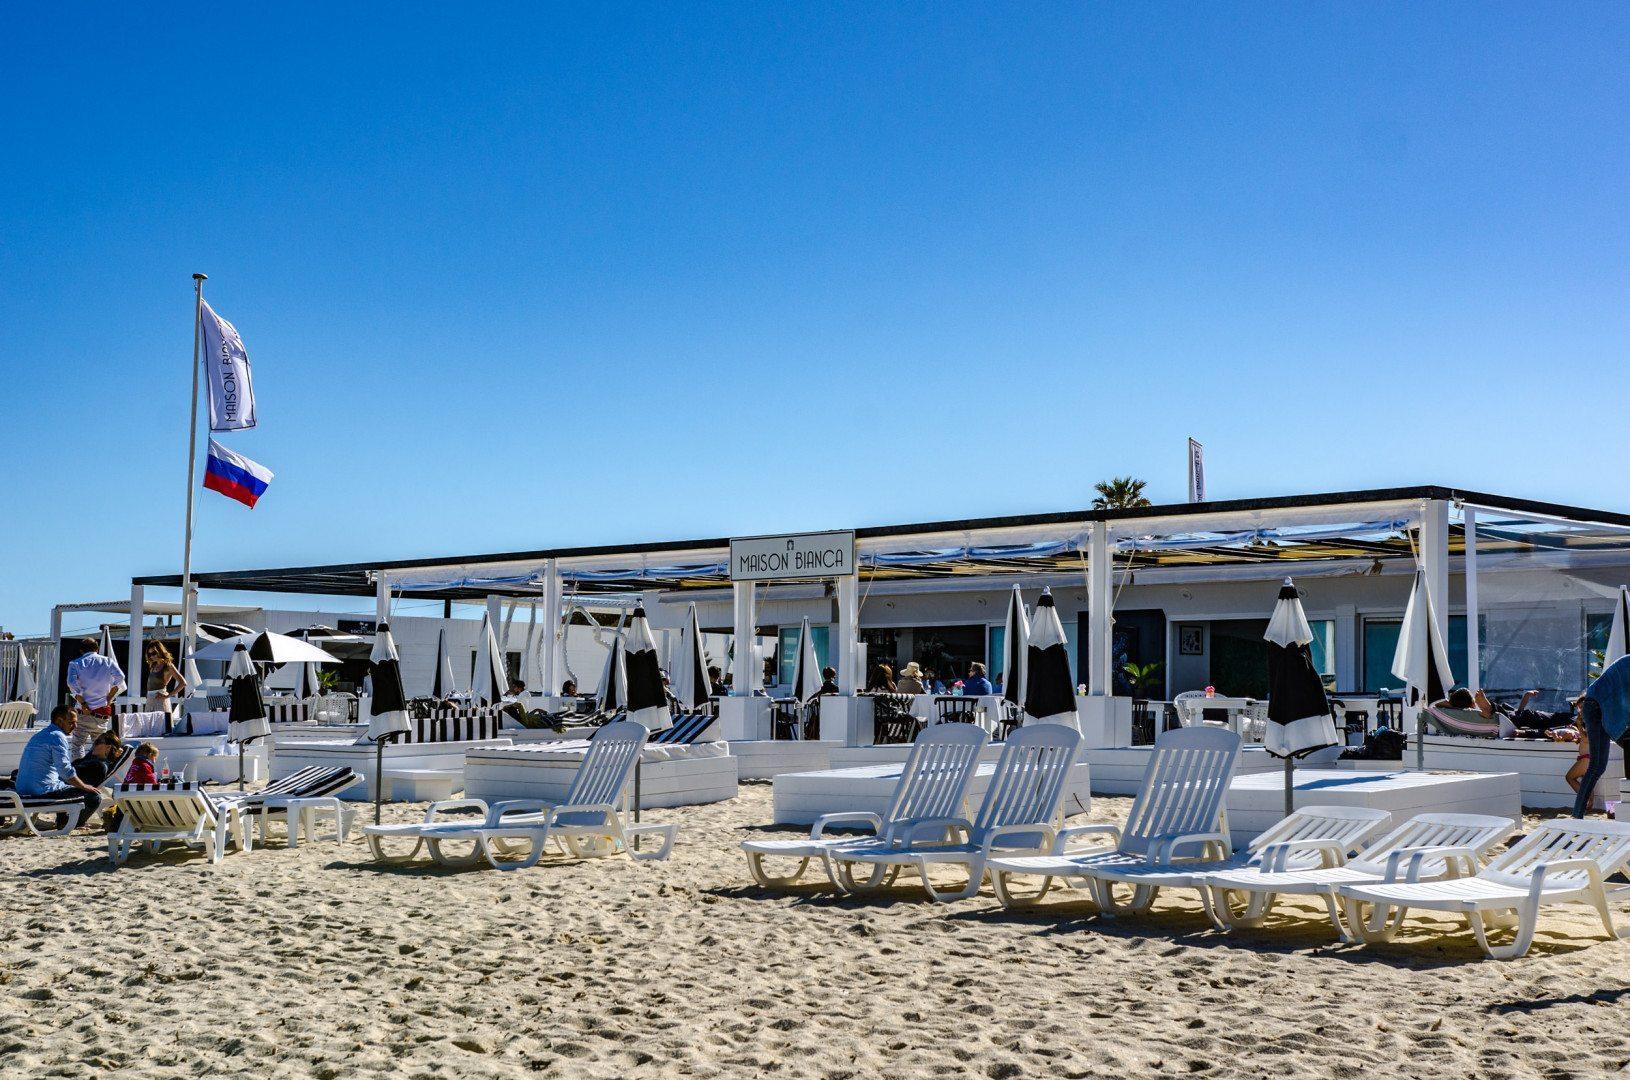 maison-bianca-beach-club-pampelonne-saint-tropez